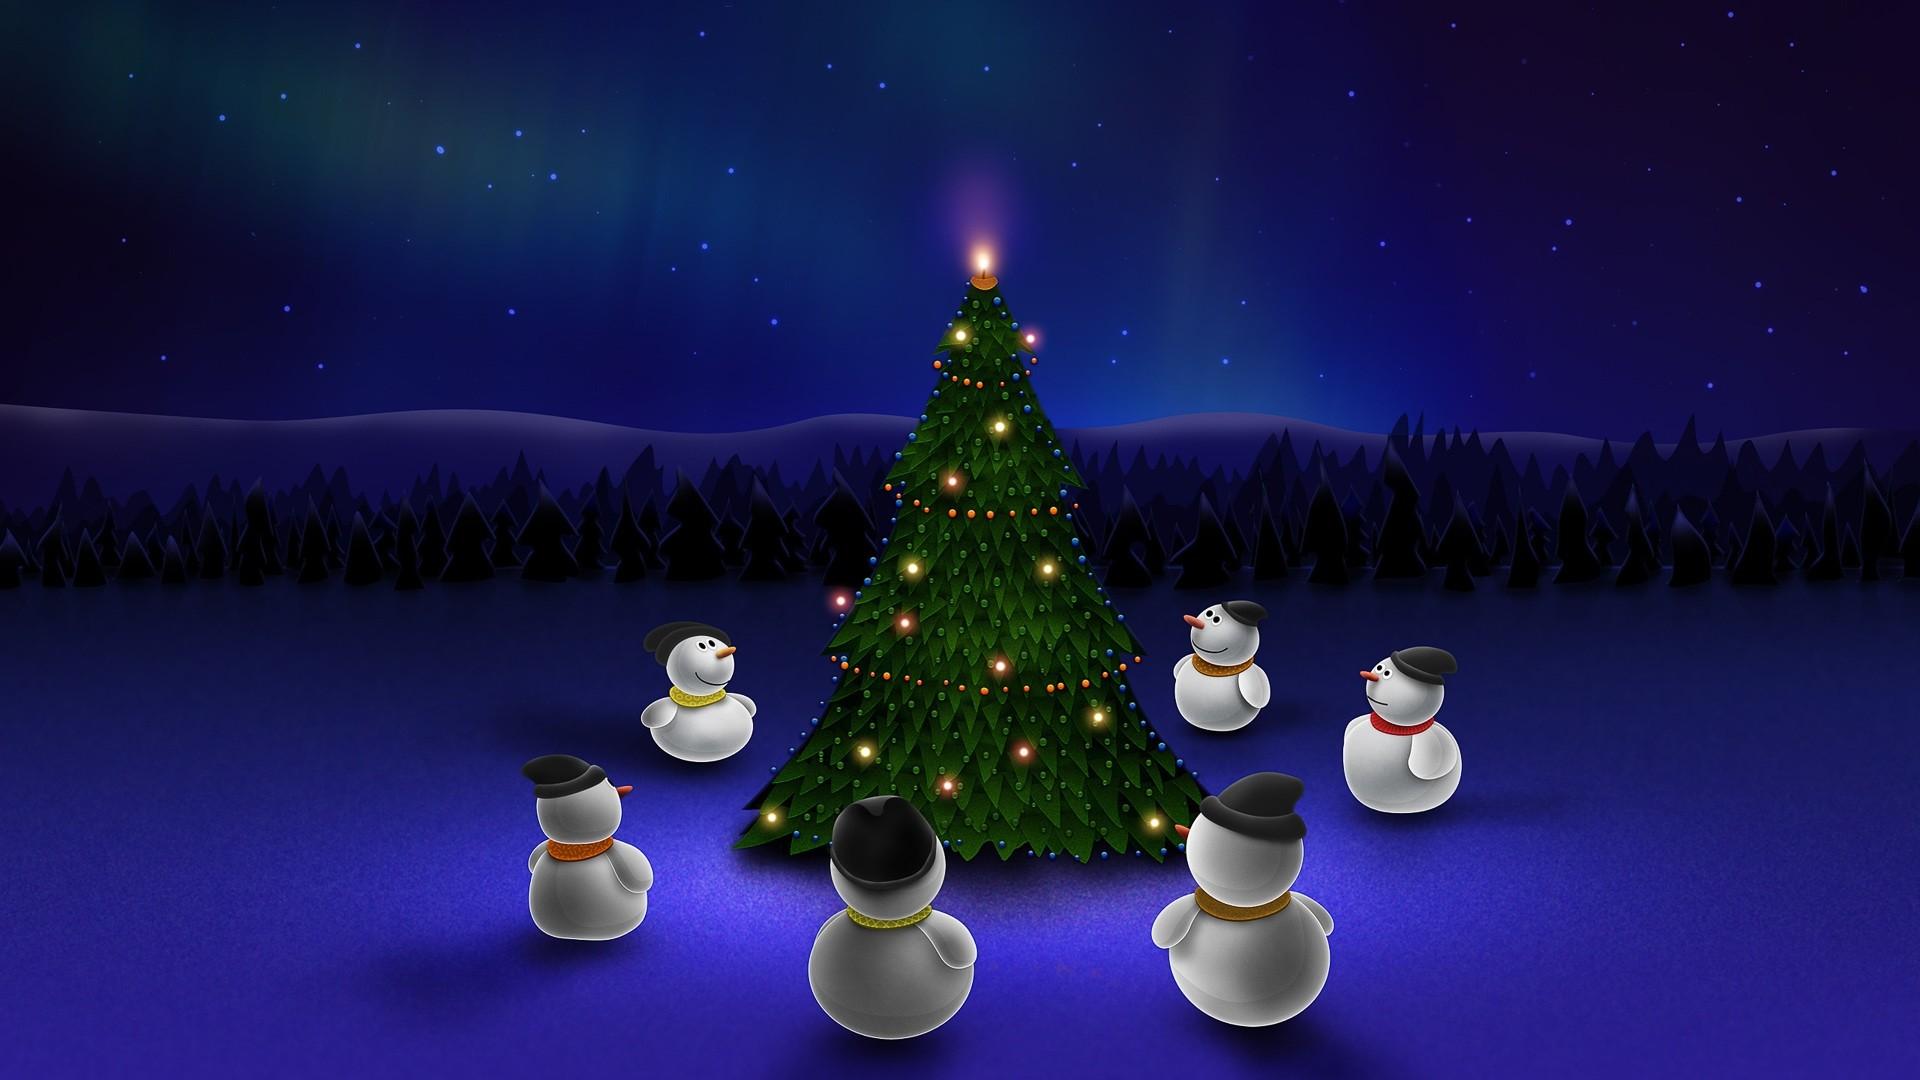 Christmas Wallpaper Background.55 Animated Christmas Wallpapers For Desktop